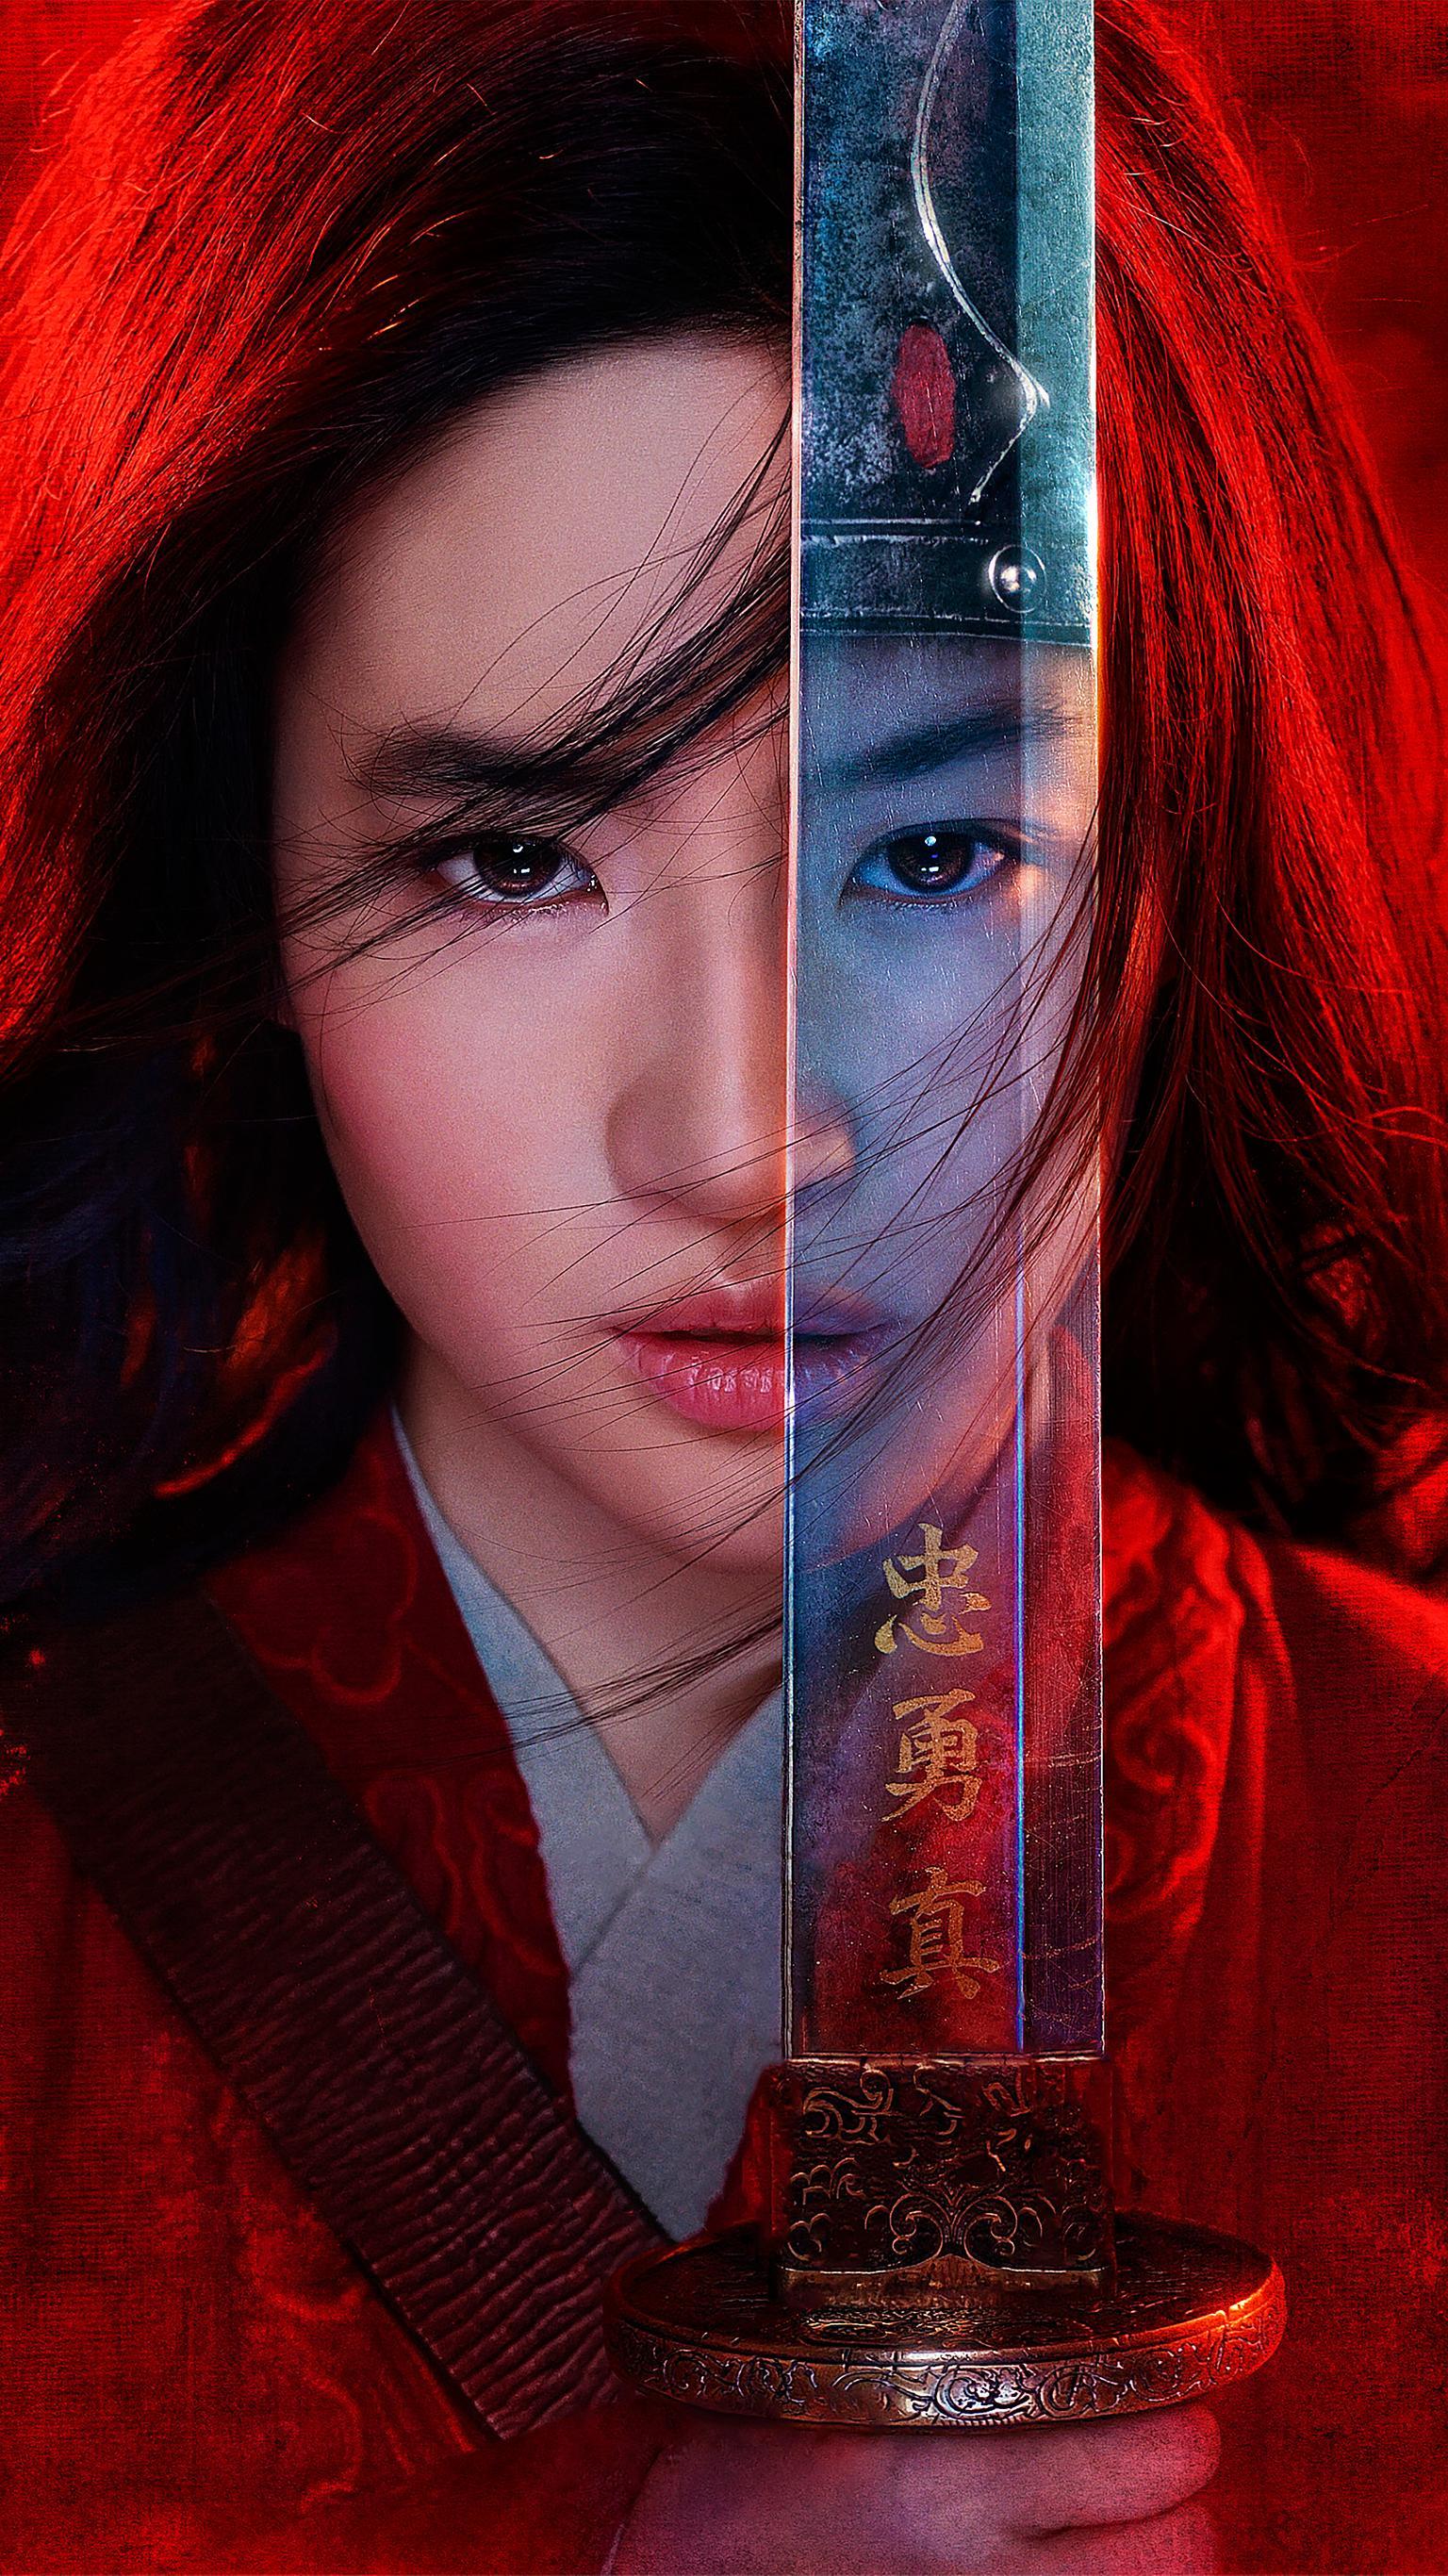 Mulan 2020 Phone Wallpaper Moviemania 1536x2732